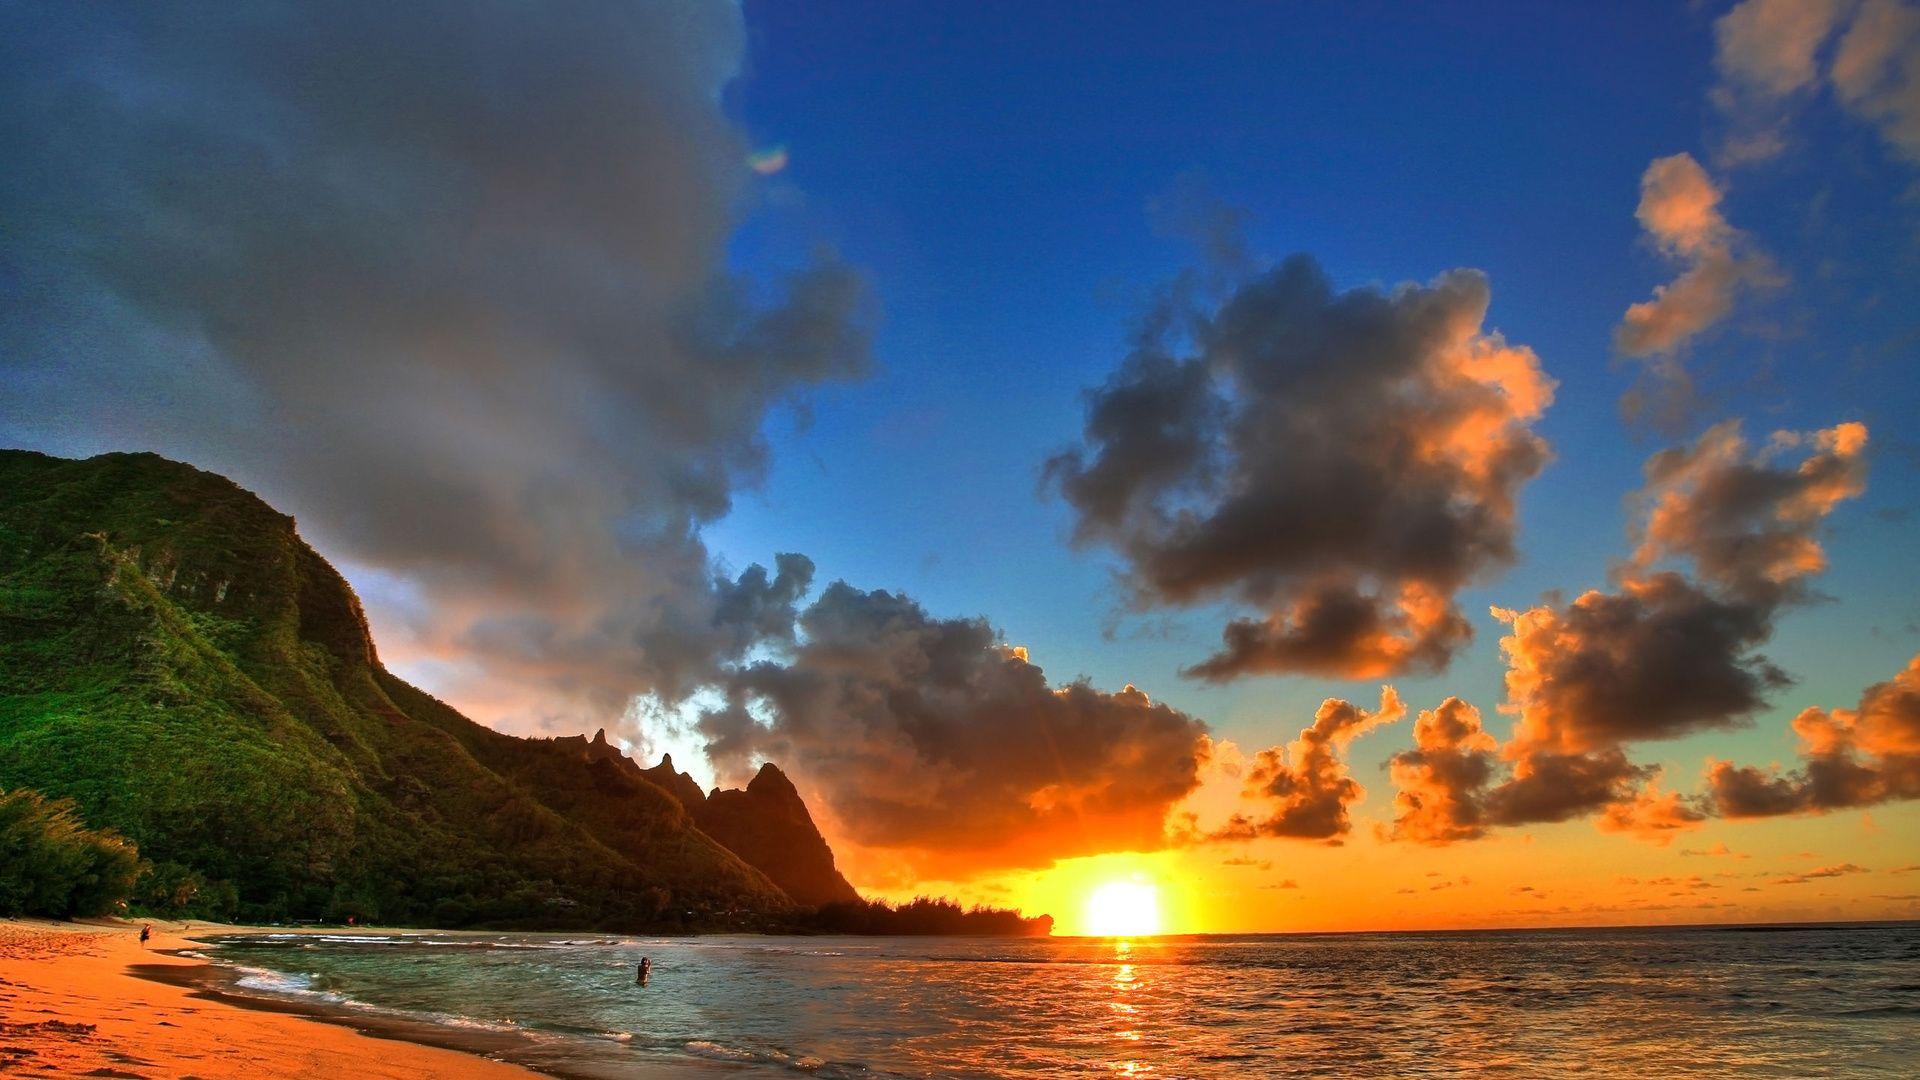 Ocean Sunset Nice Wallpaper